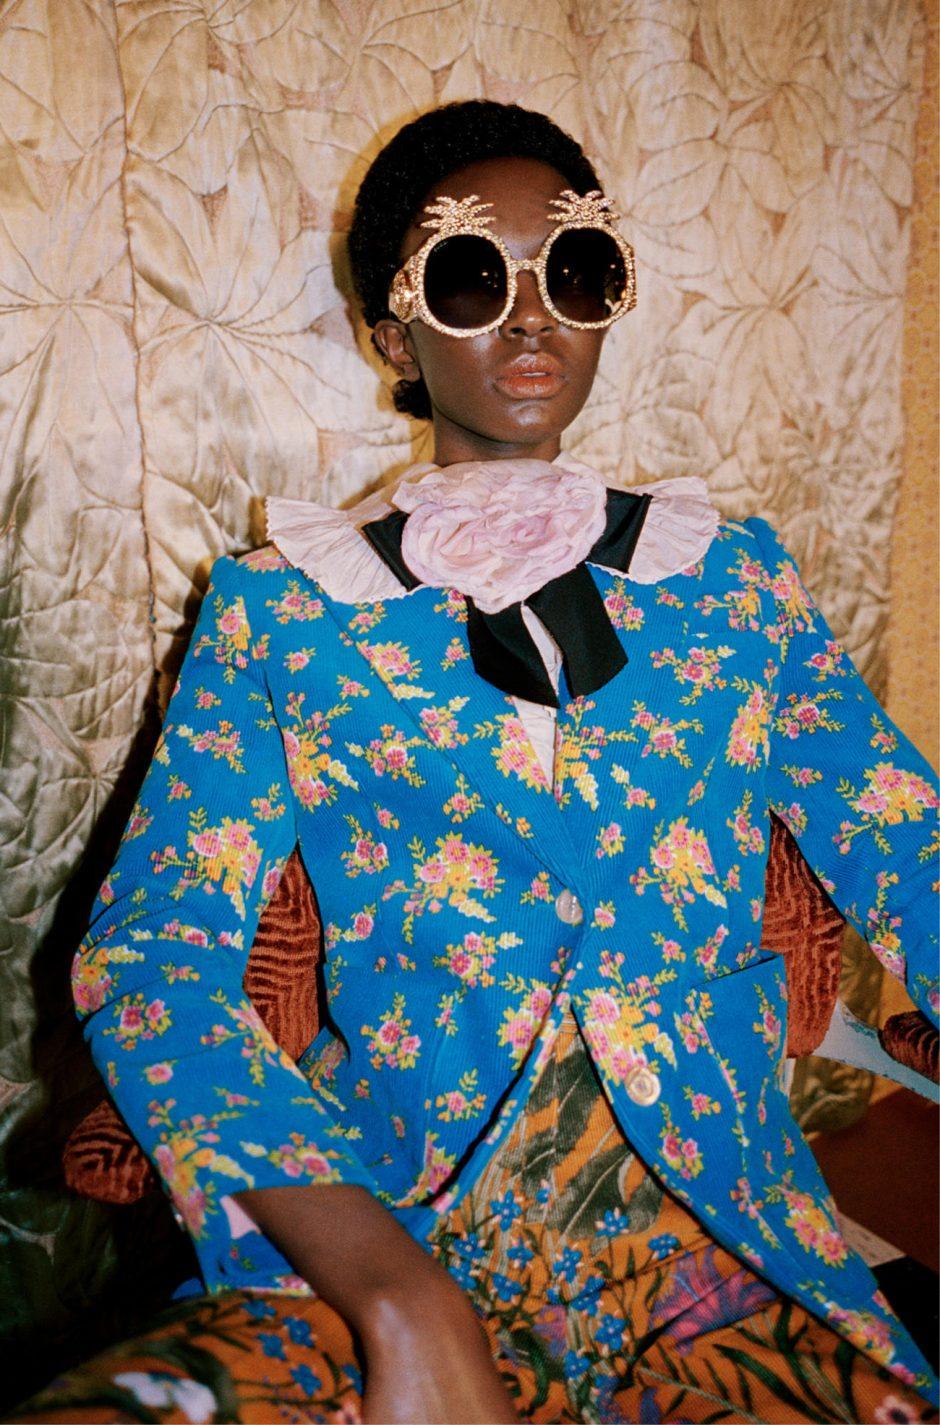 Glen Luchford, Gucci, Modefotografie, Fotografie